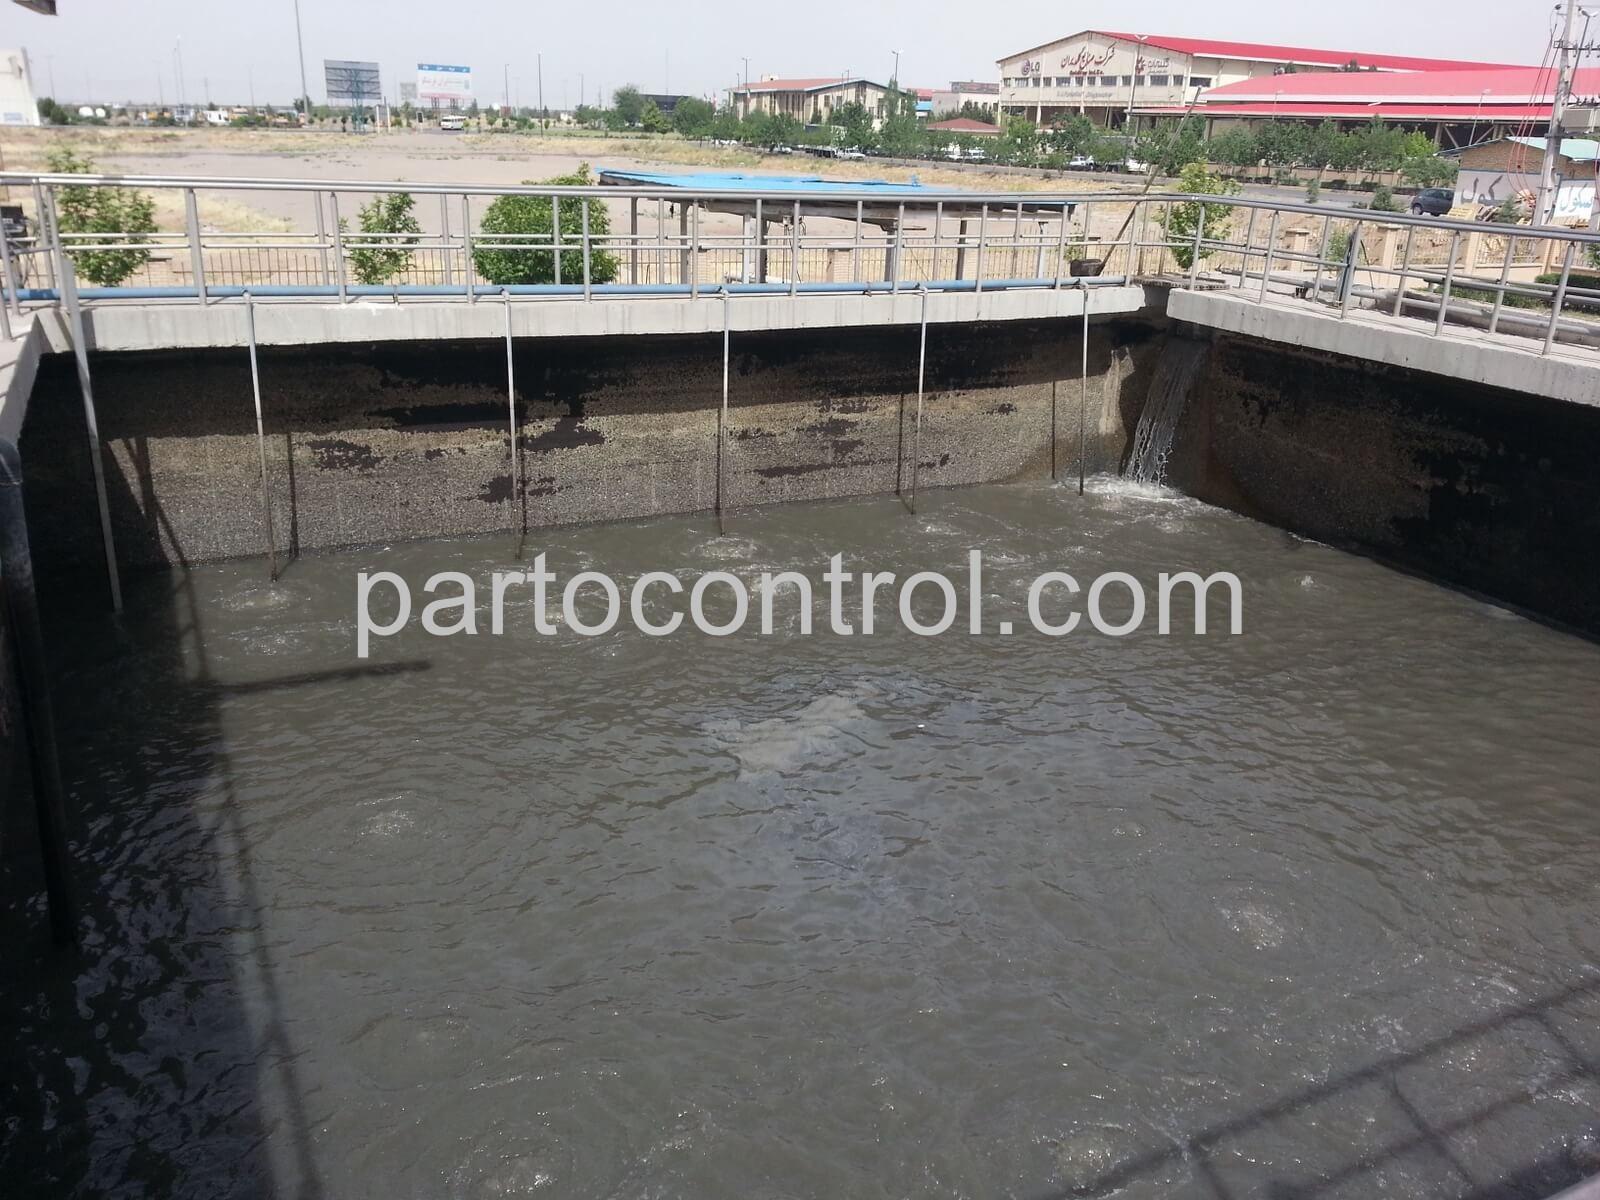 Concrete tanks in Caspian Townمخازن بتنی شهرک کاسپین 3 - پروژه مخازن بتنی